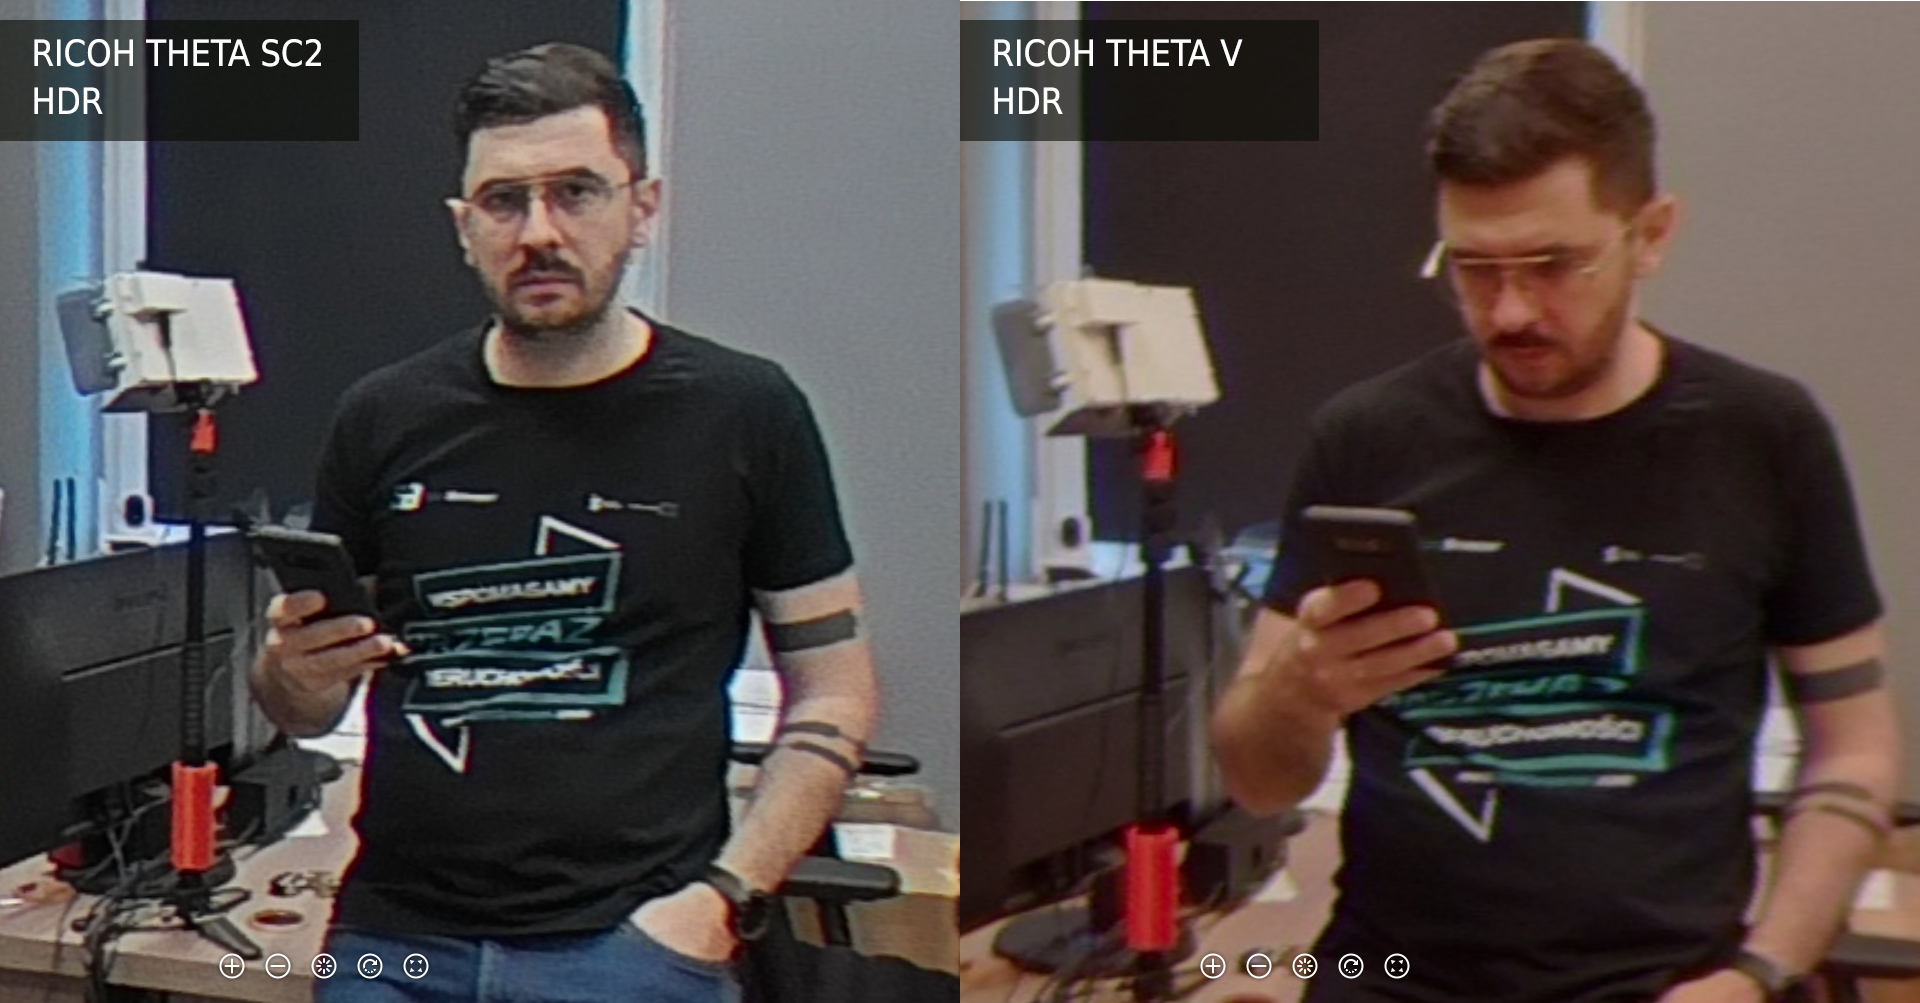 Ricoh Theta SC2 vs V tryb HDR